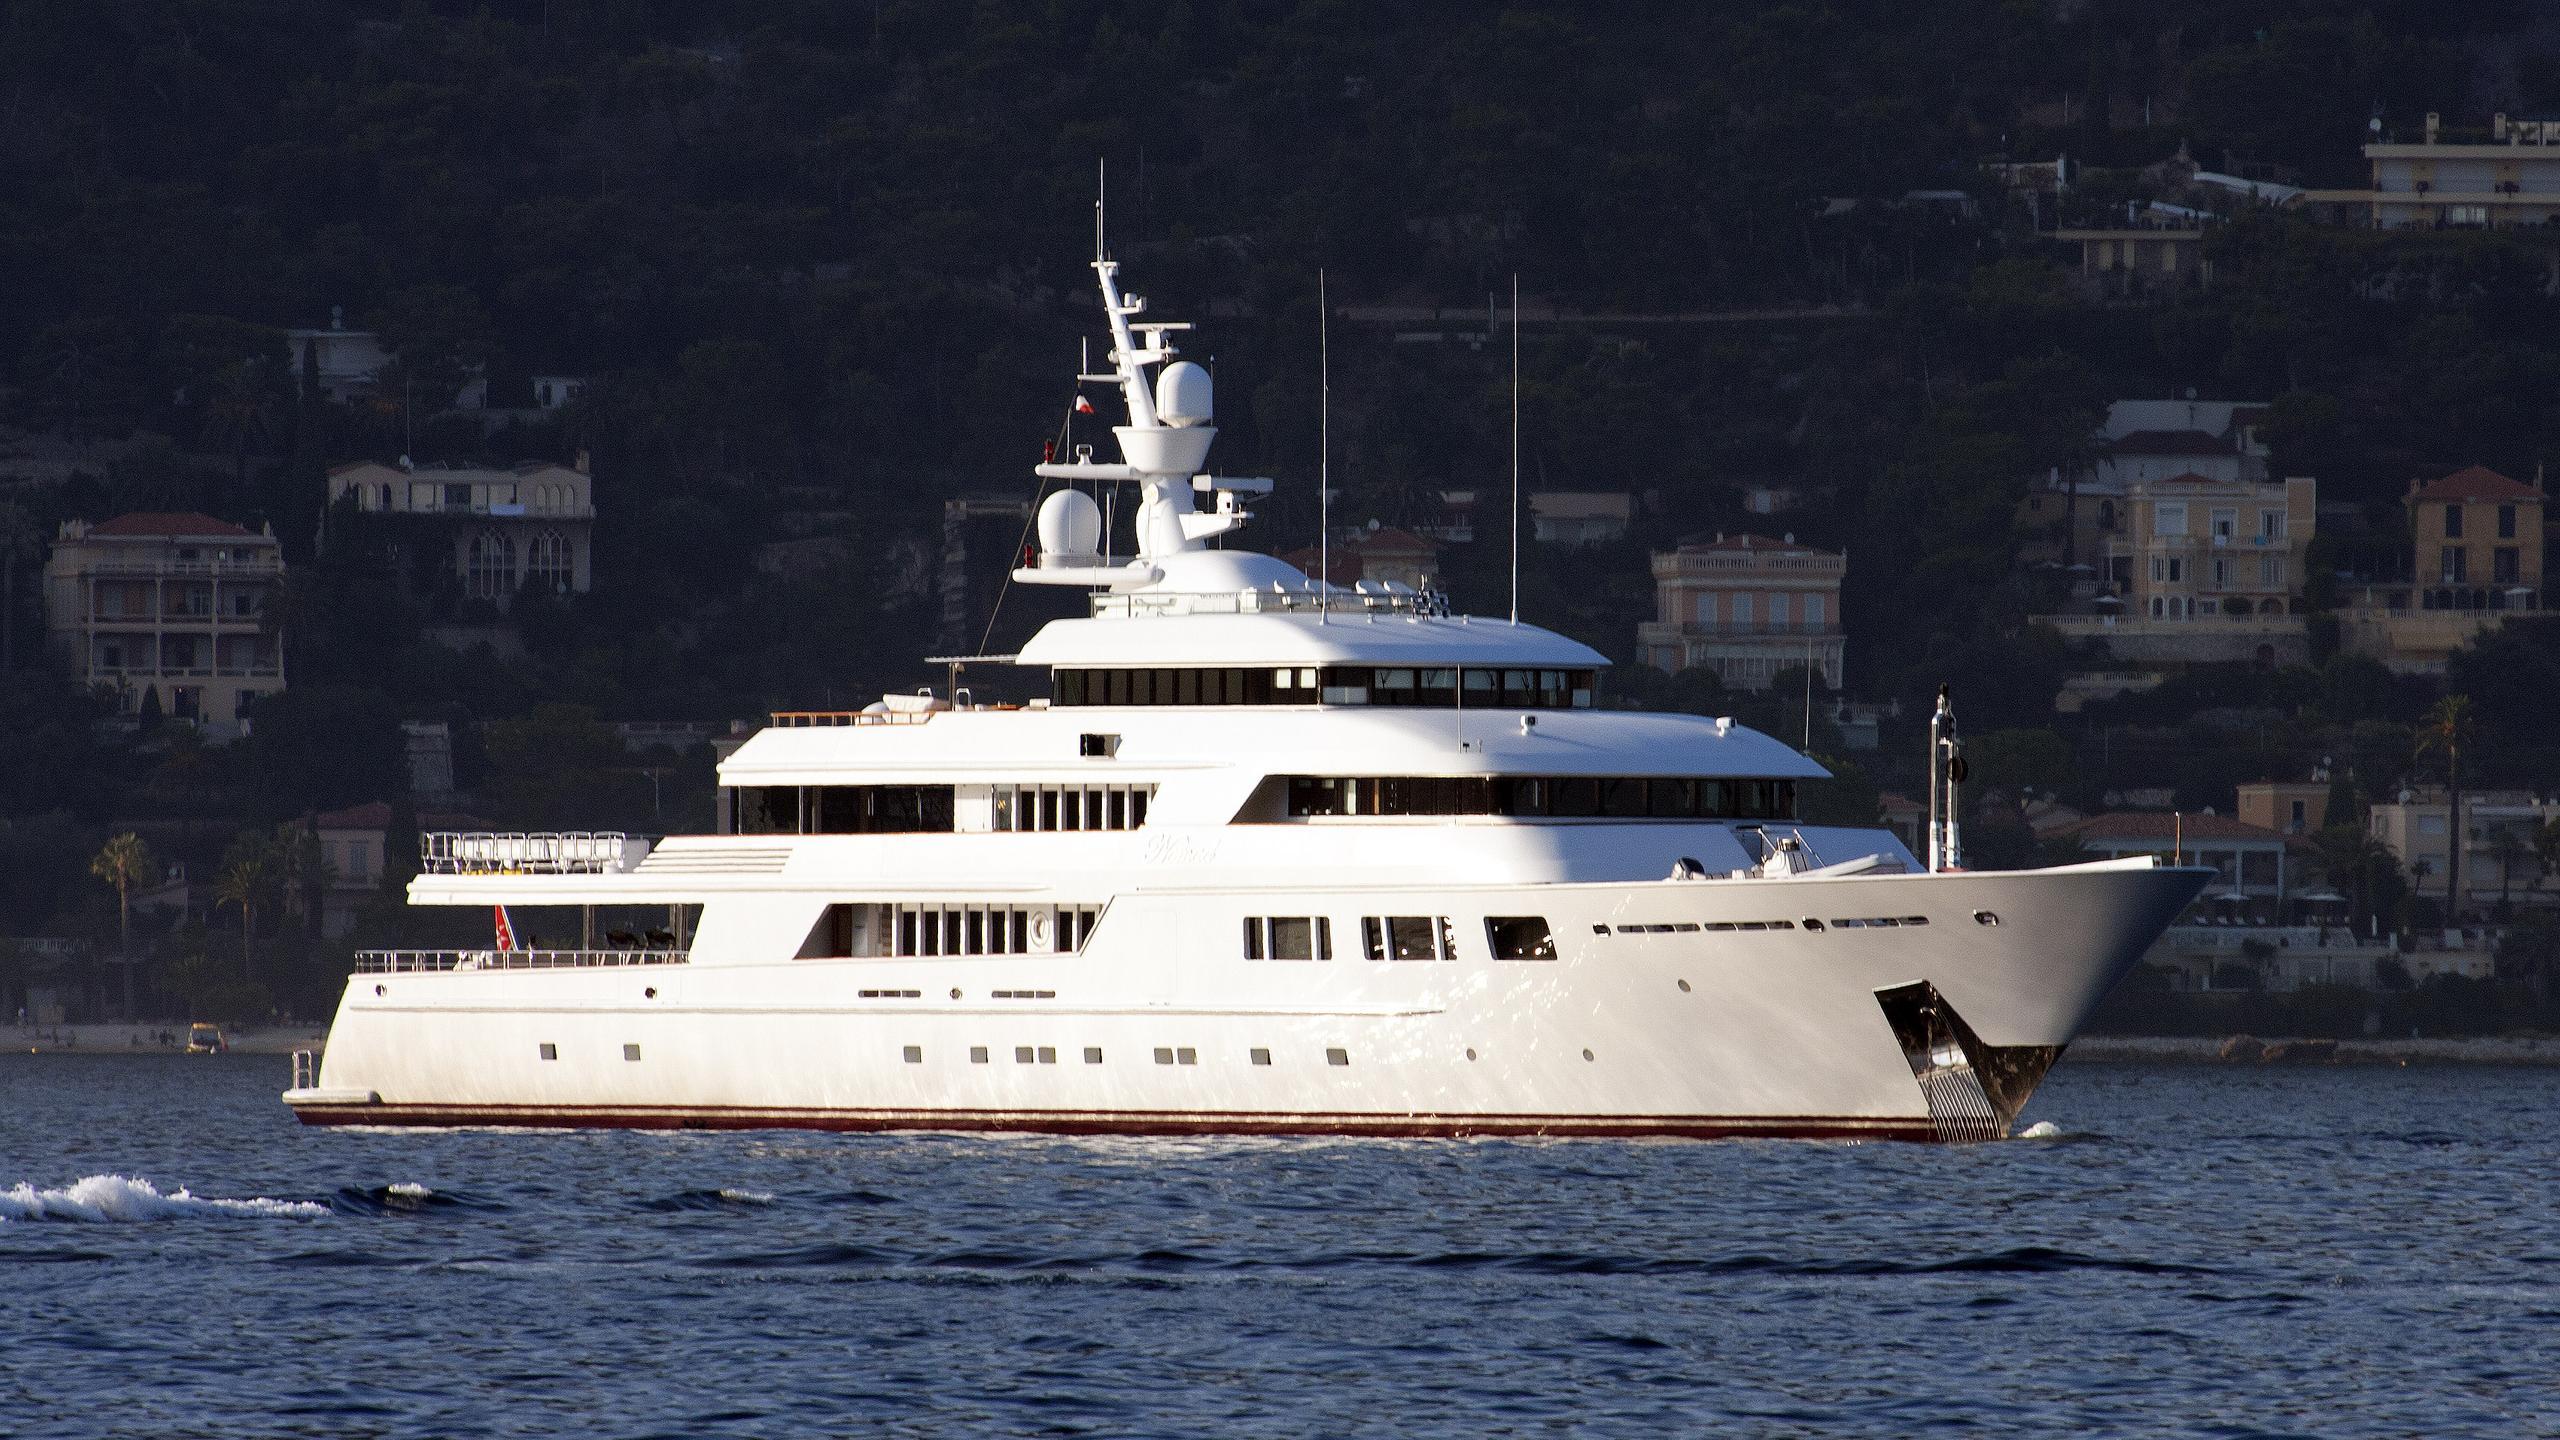 nomad-explorer-yacht-oceanfast-2003-70m-half-profile